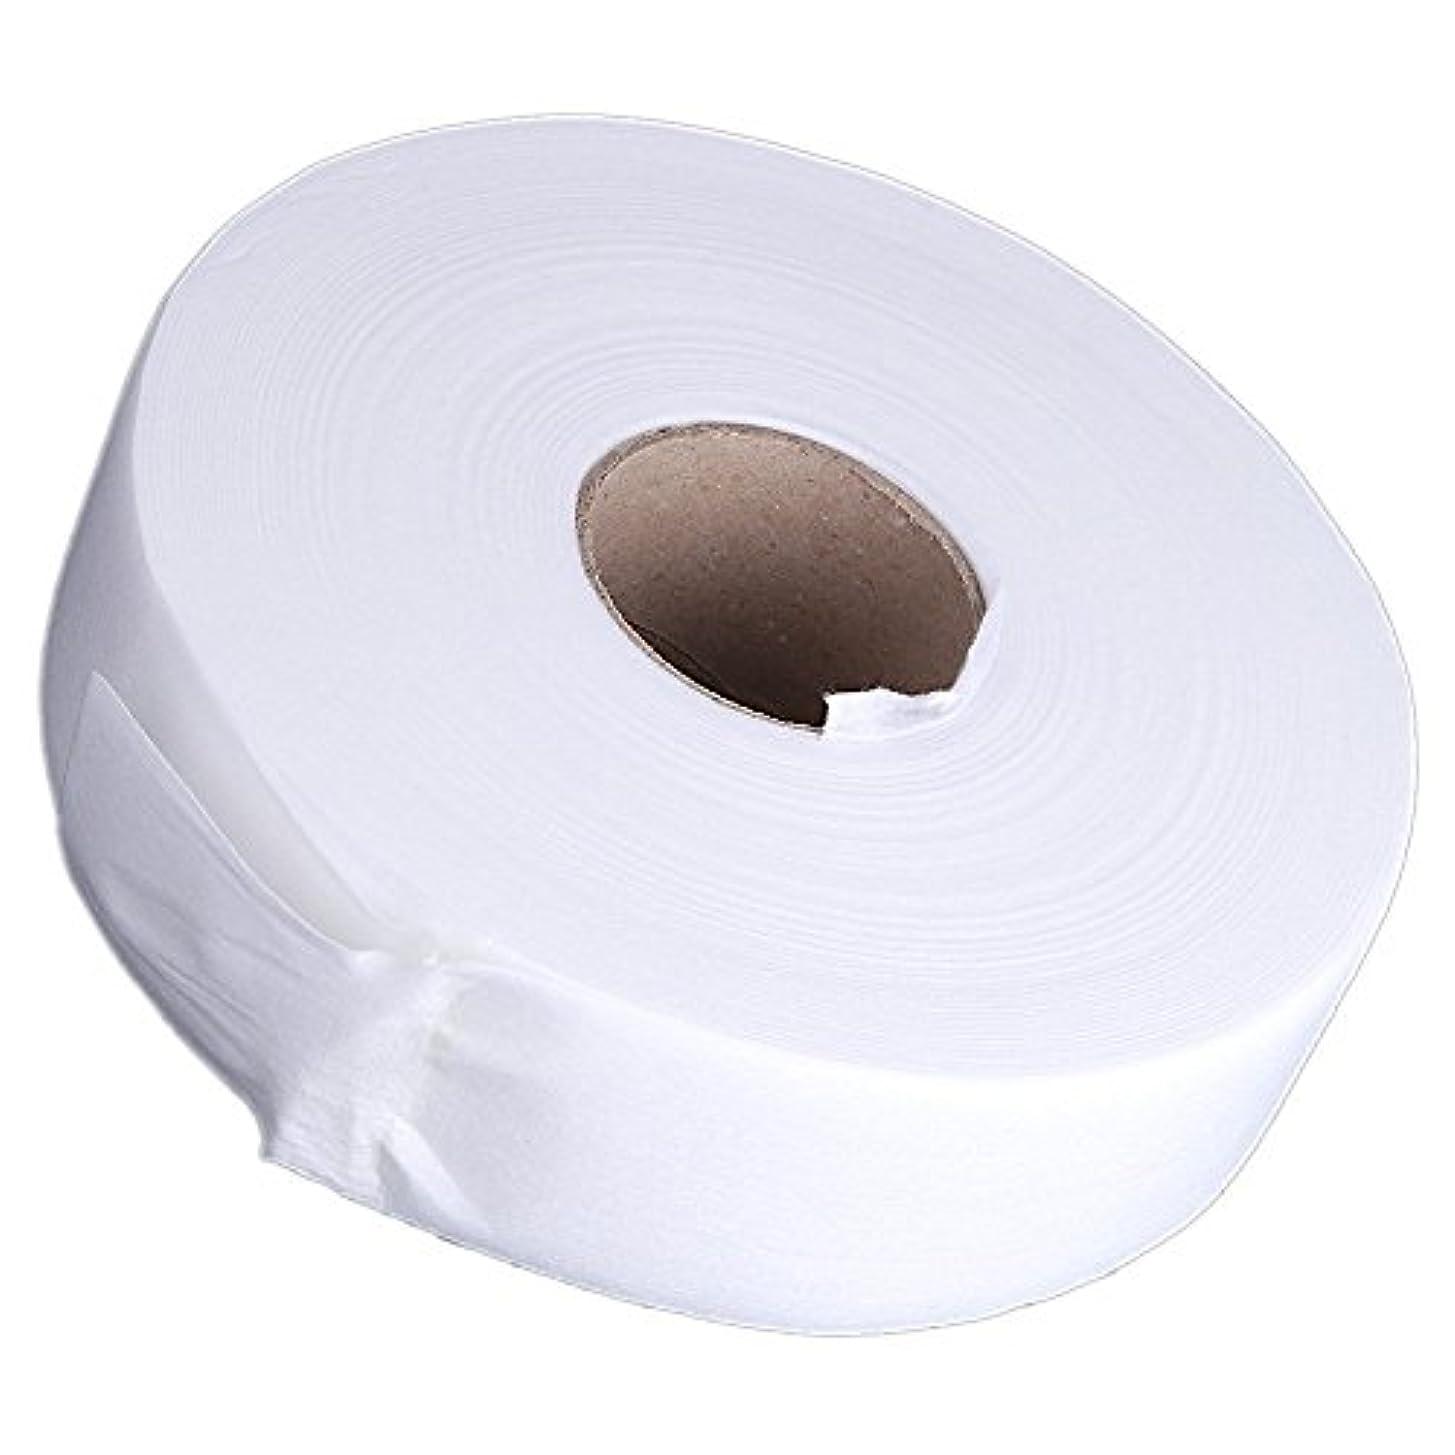 SODIAL 100ヤードの脱毛紙脱毛ワックスストリップ 不織布ペーパーワックスロール(白)